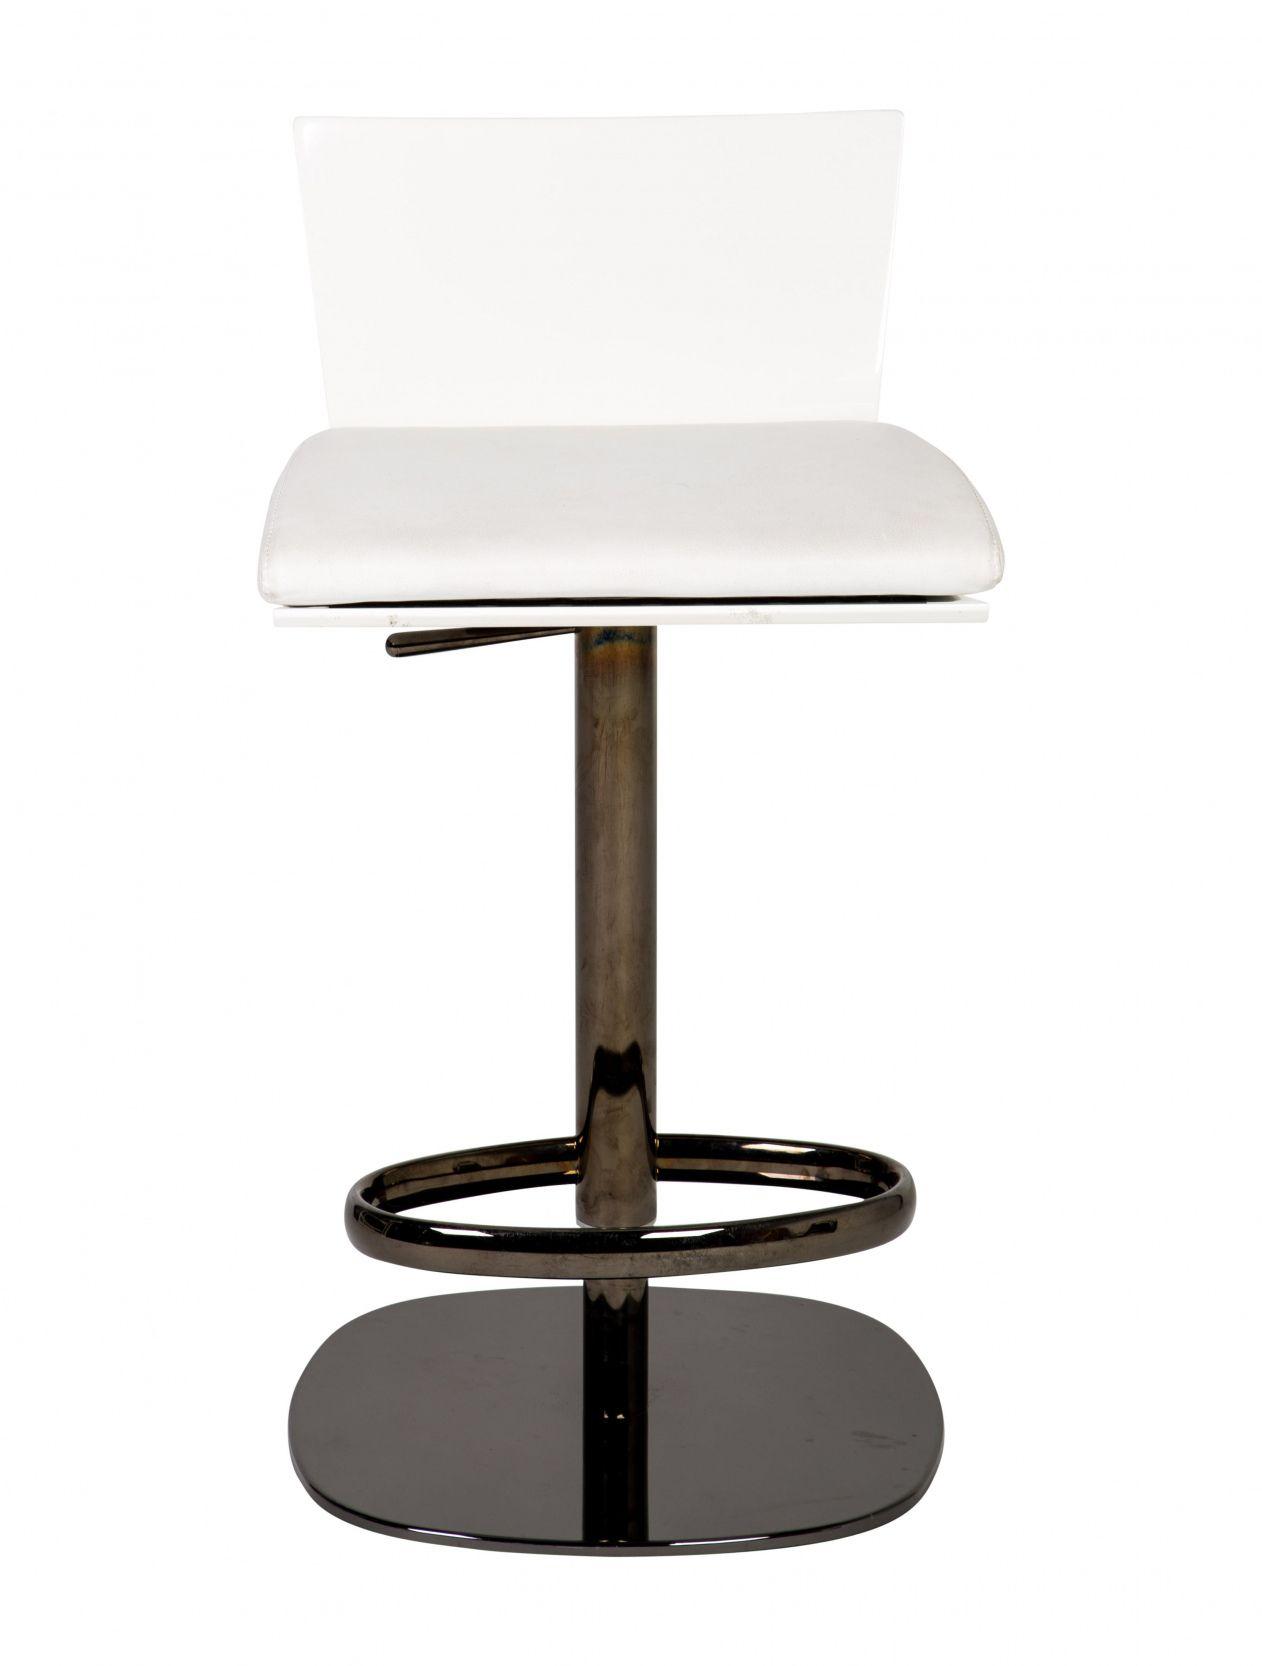 55 Bar Stool Bottoms Modern Clic Furniture Check More At Http